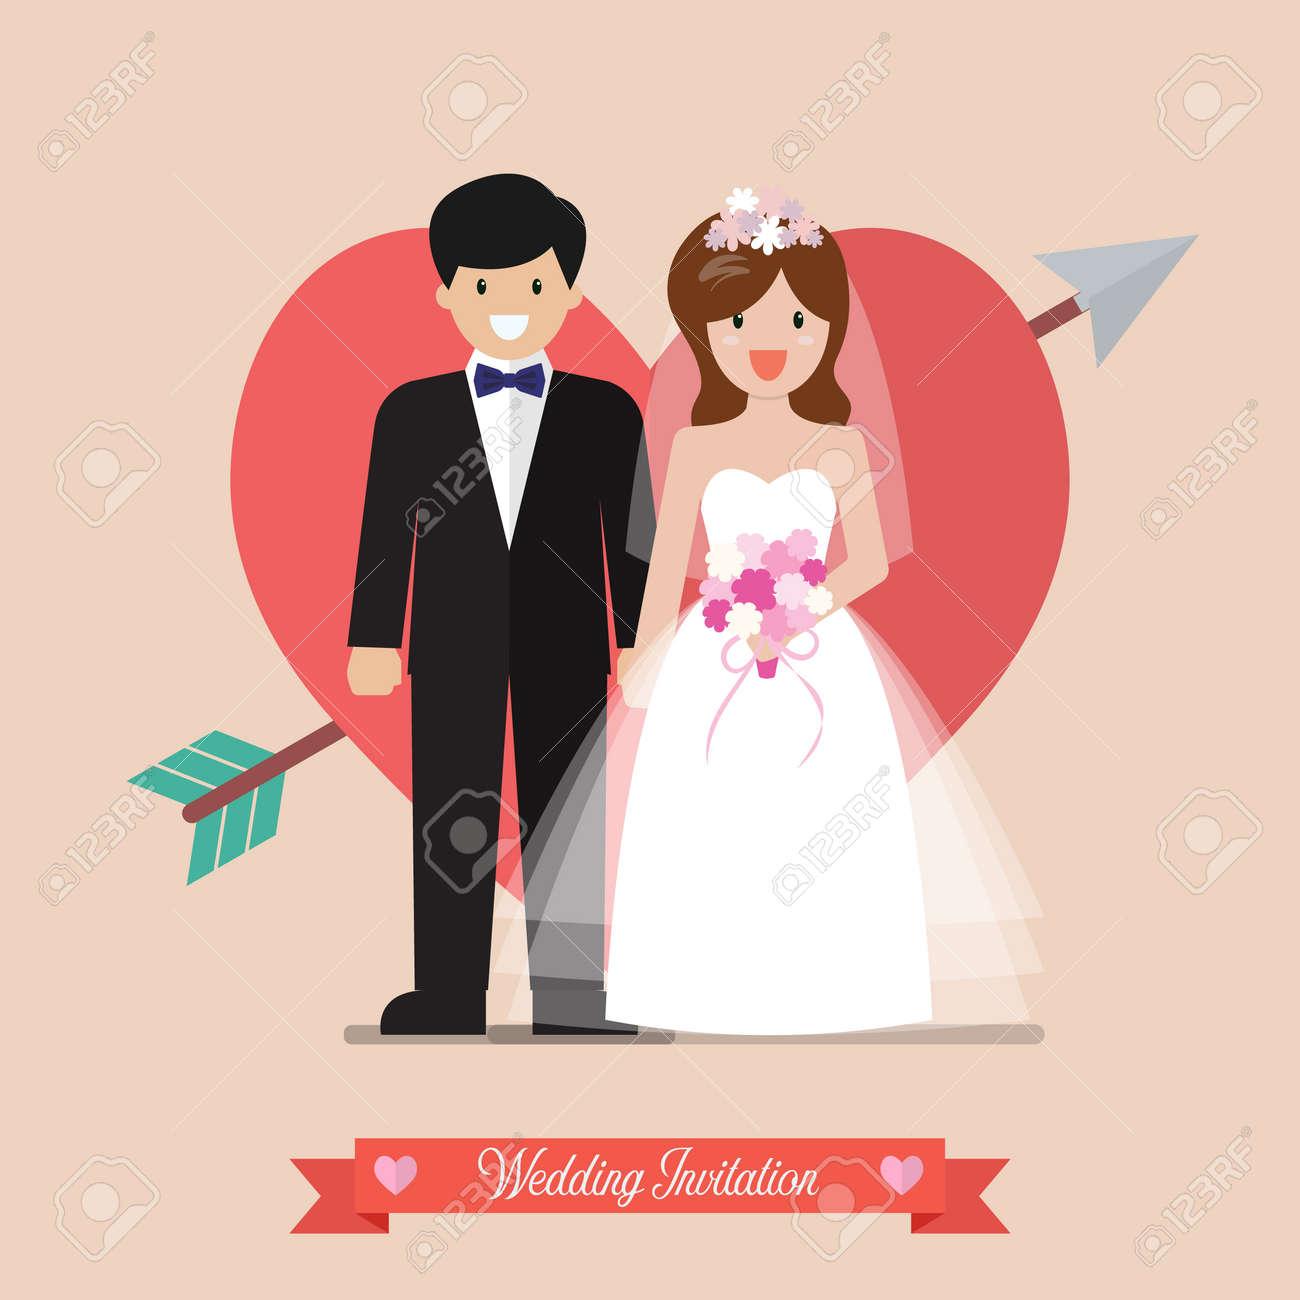 Newlyweds Bride And Groom Wedding Invitation. Vector Illustration ...